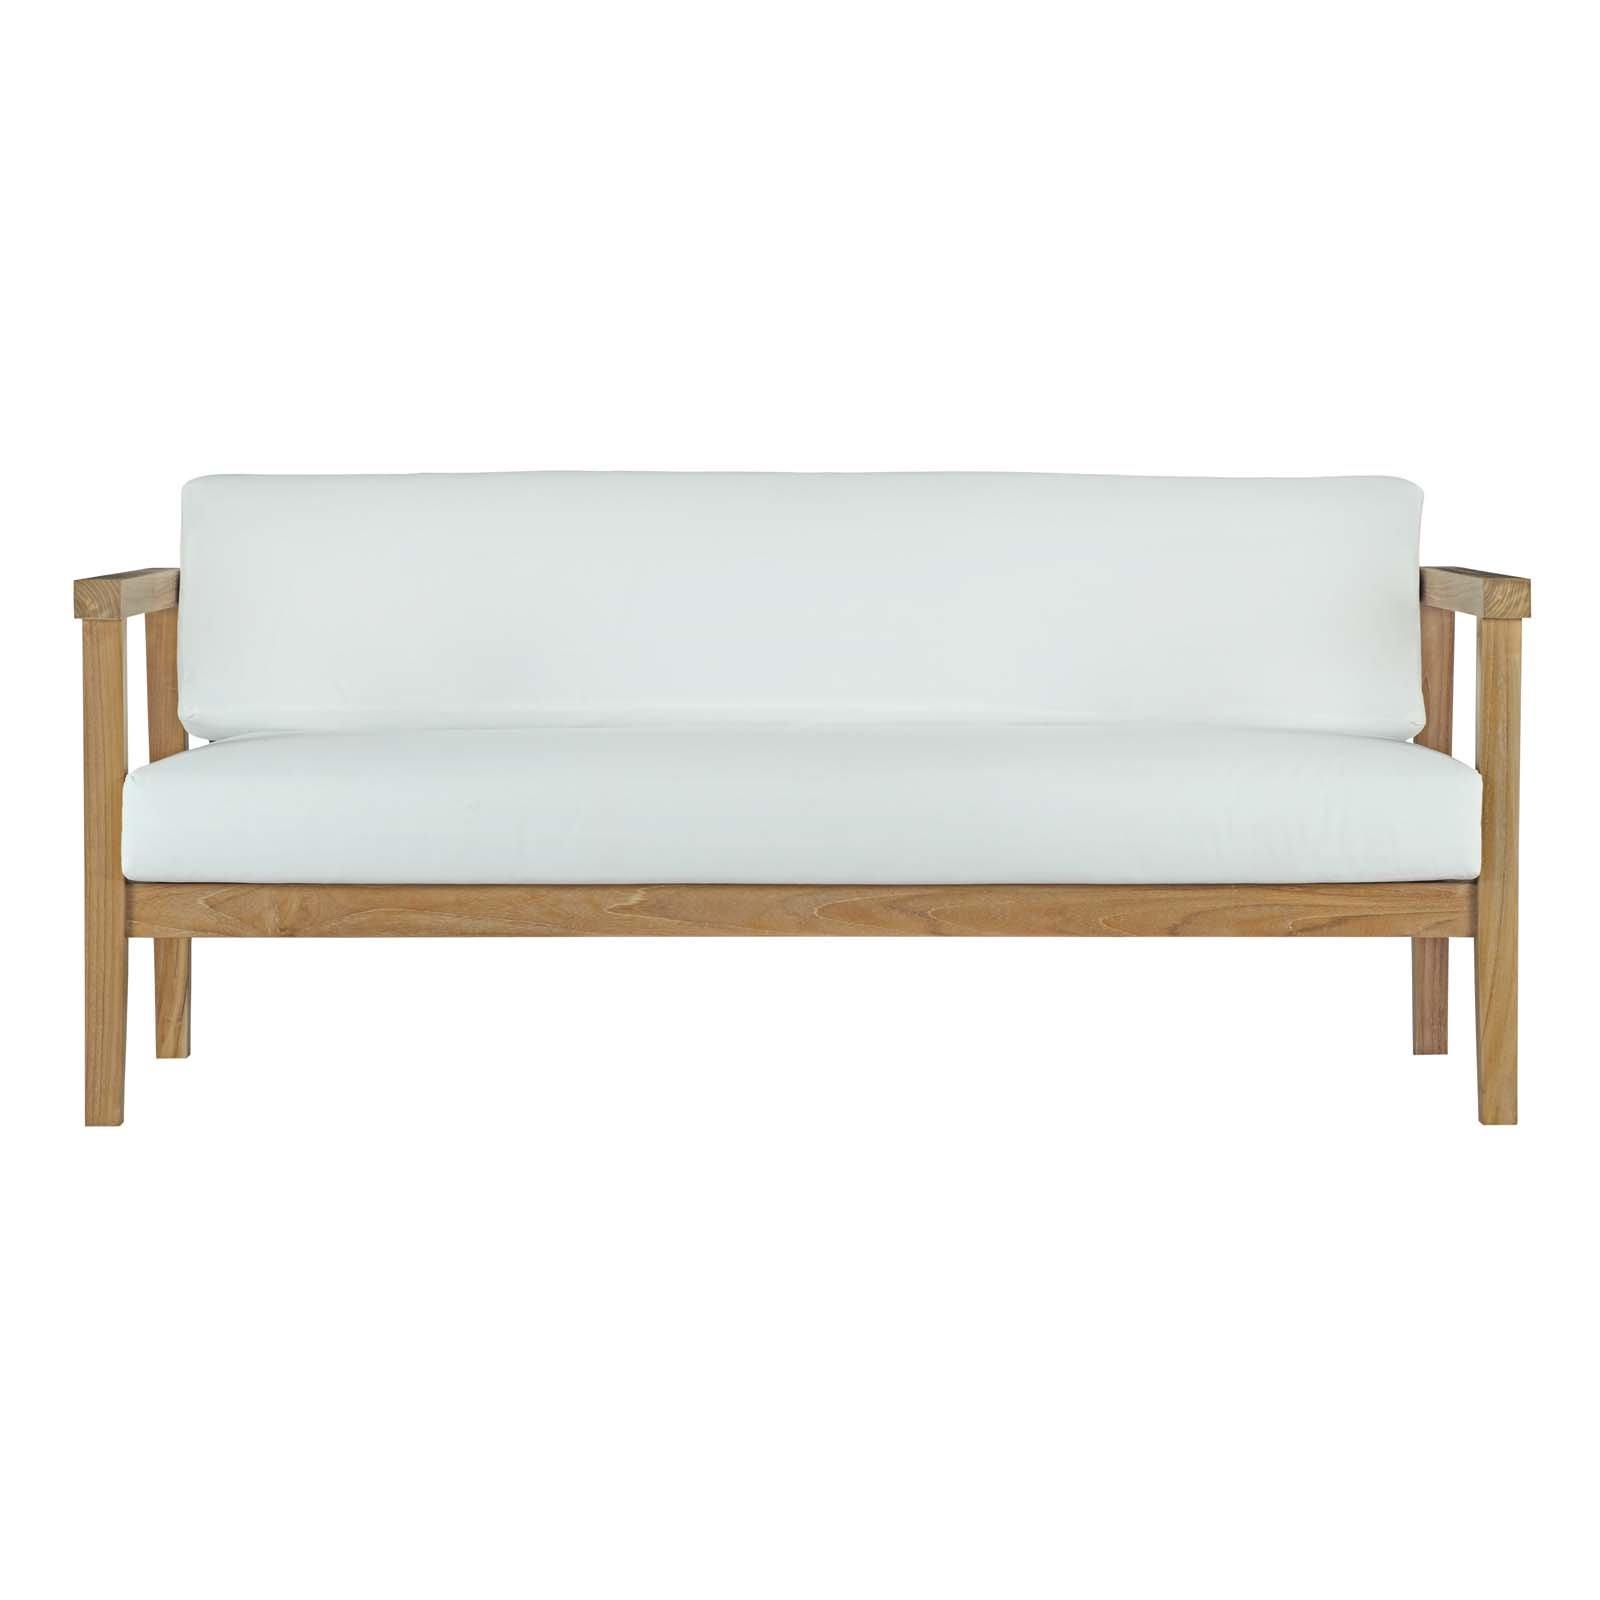 Trendy Montford Teak Loveseats With Cushions Within Modern Loveseat Teak Patio Sofas (View 16 of 20)